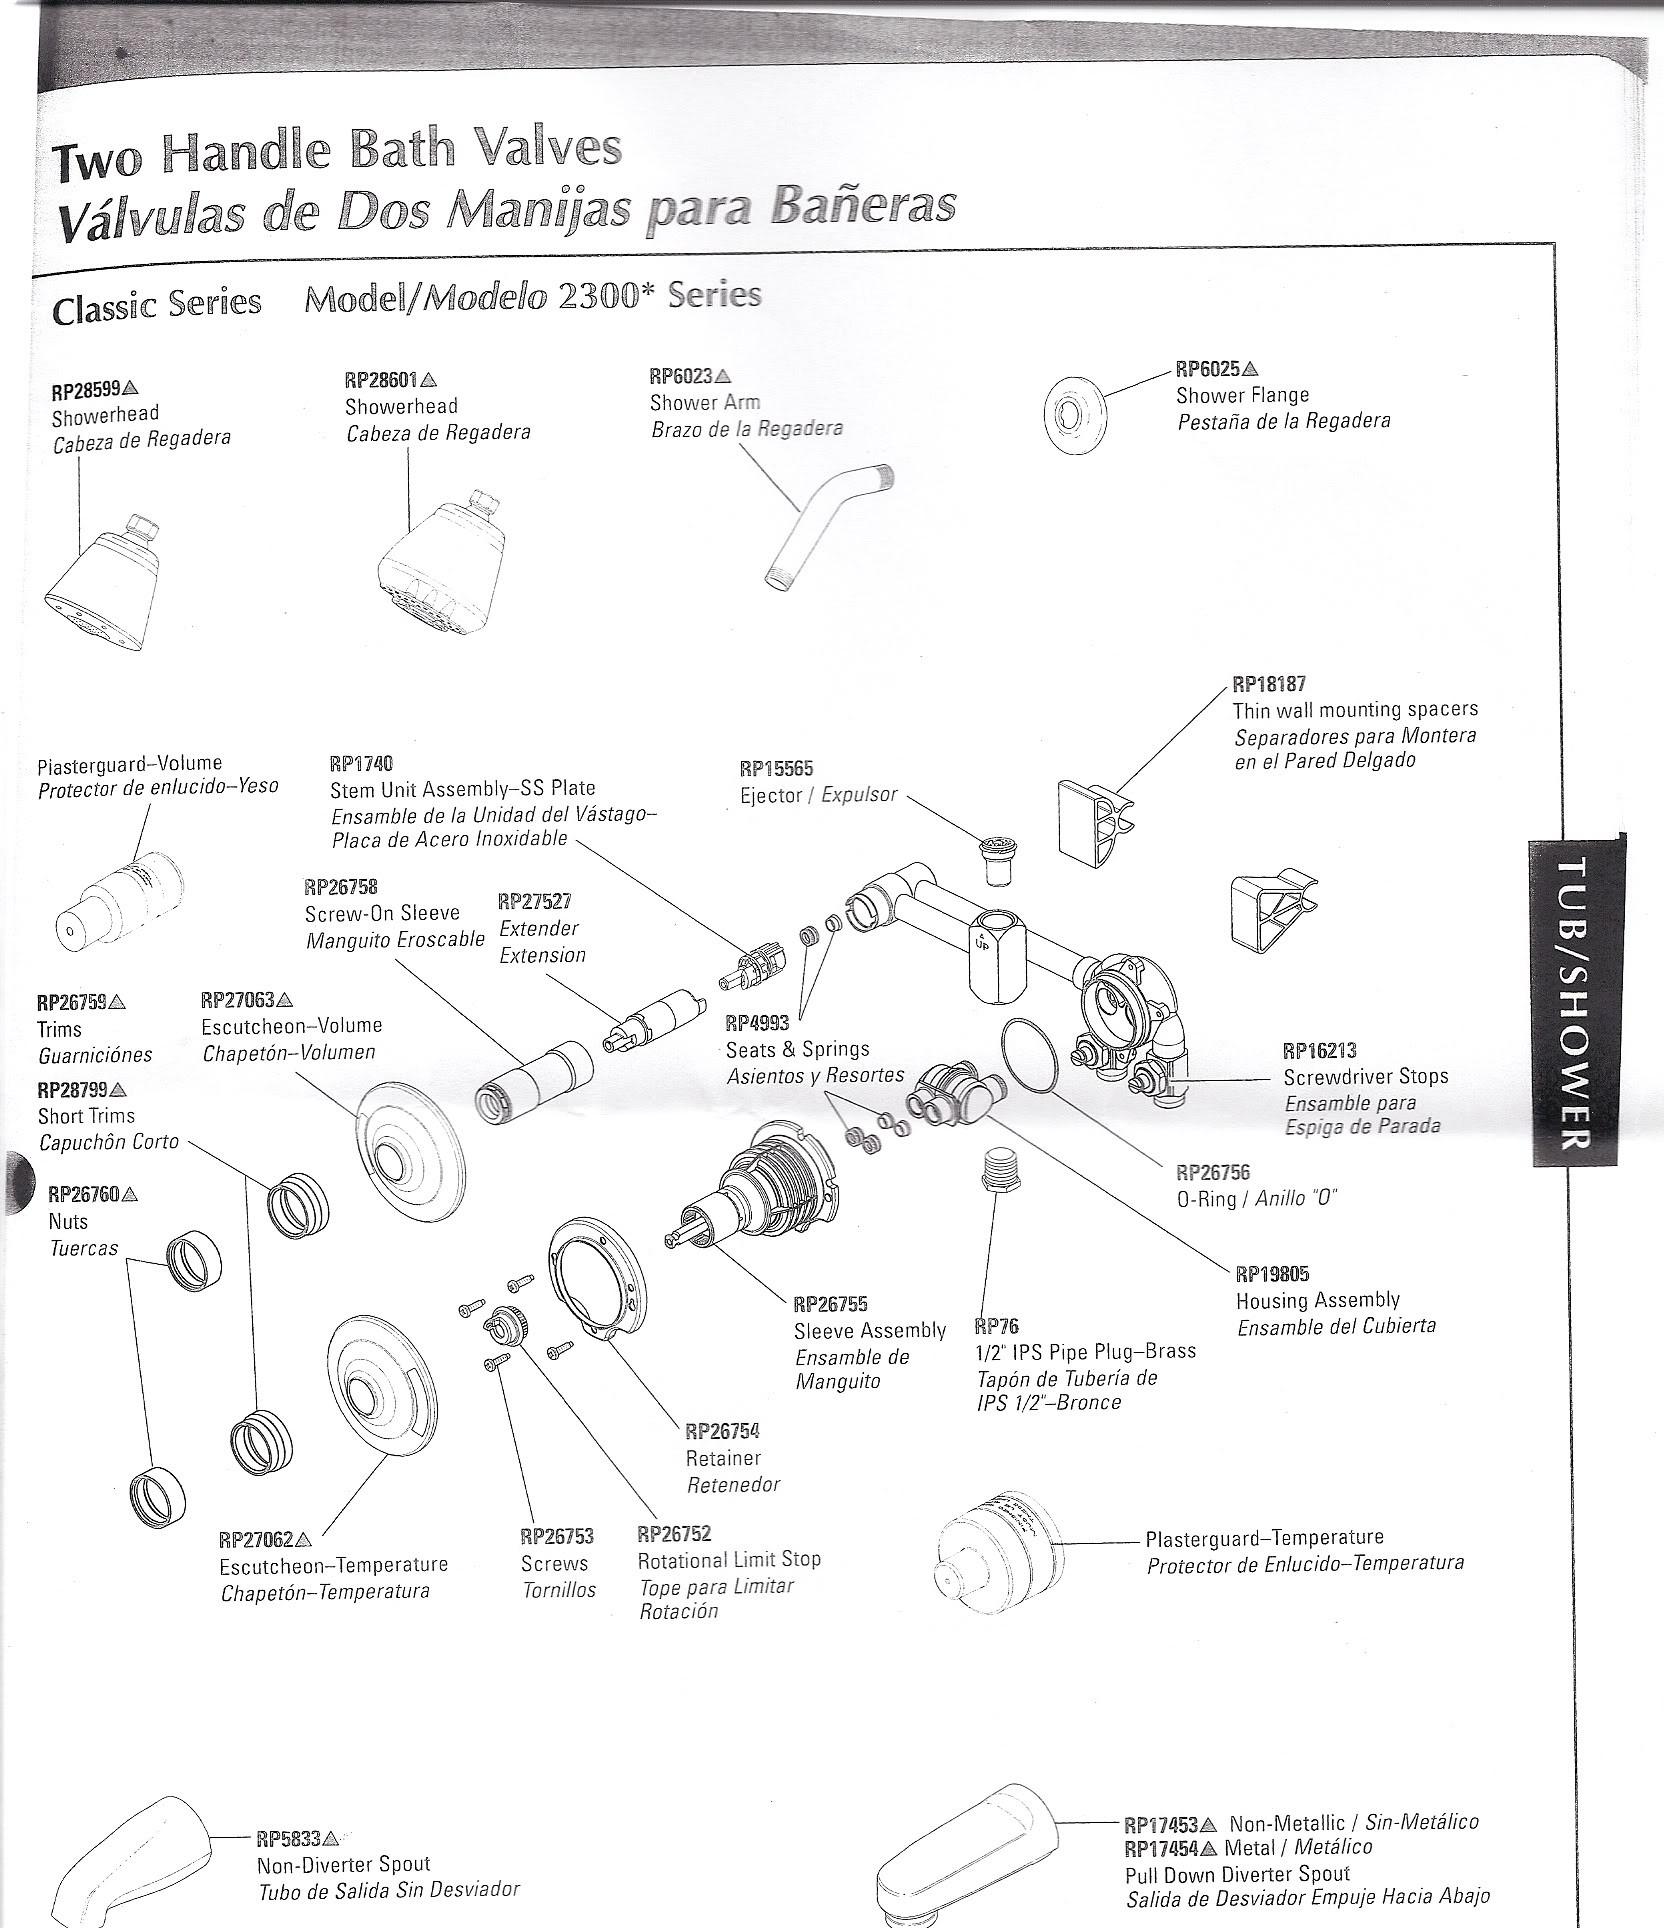 American Standard Shower Faucet Parts Diagram Lovely Delta Monitor Shower Faucet Parts 50 S Of American Standard Shower Faucet Parts Diagram